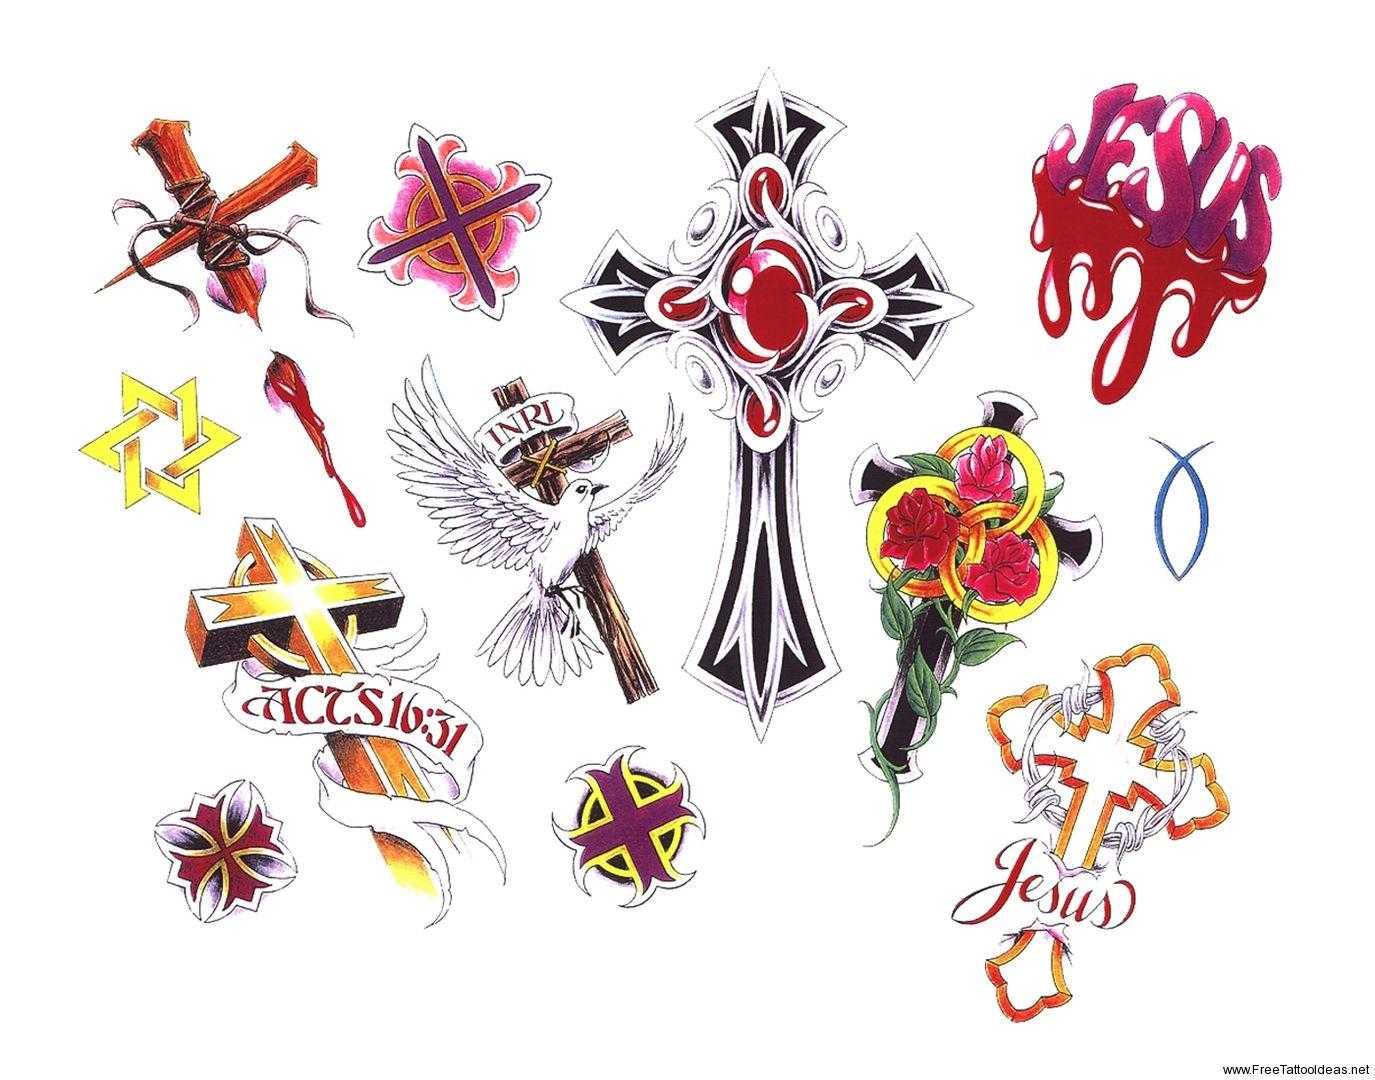 Free Printable Tattoo Flash | Cross Tattoos Designs - Free Cross - Free Printable Flash Tattoo